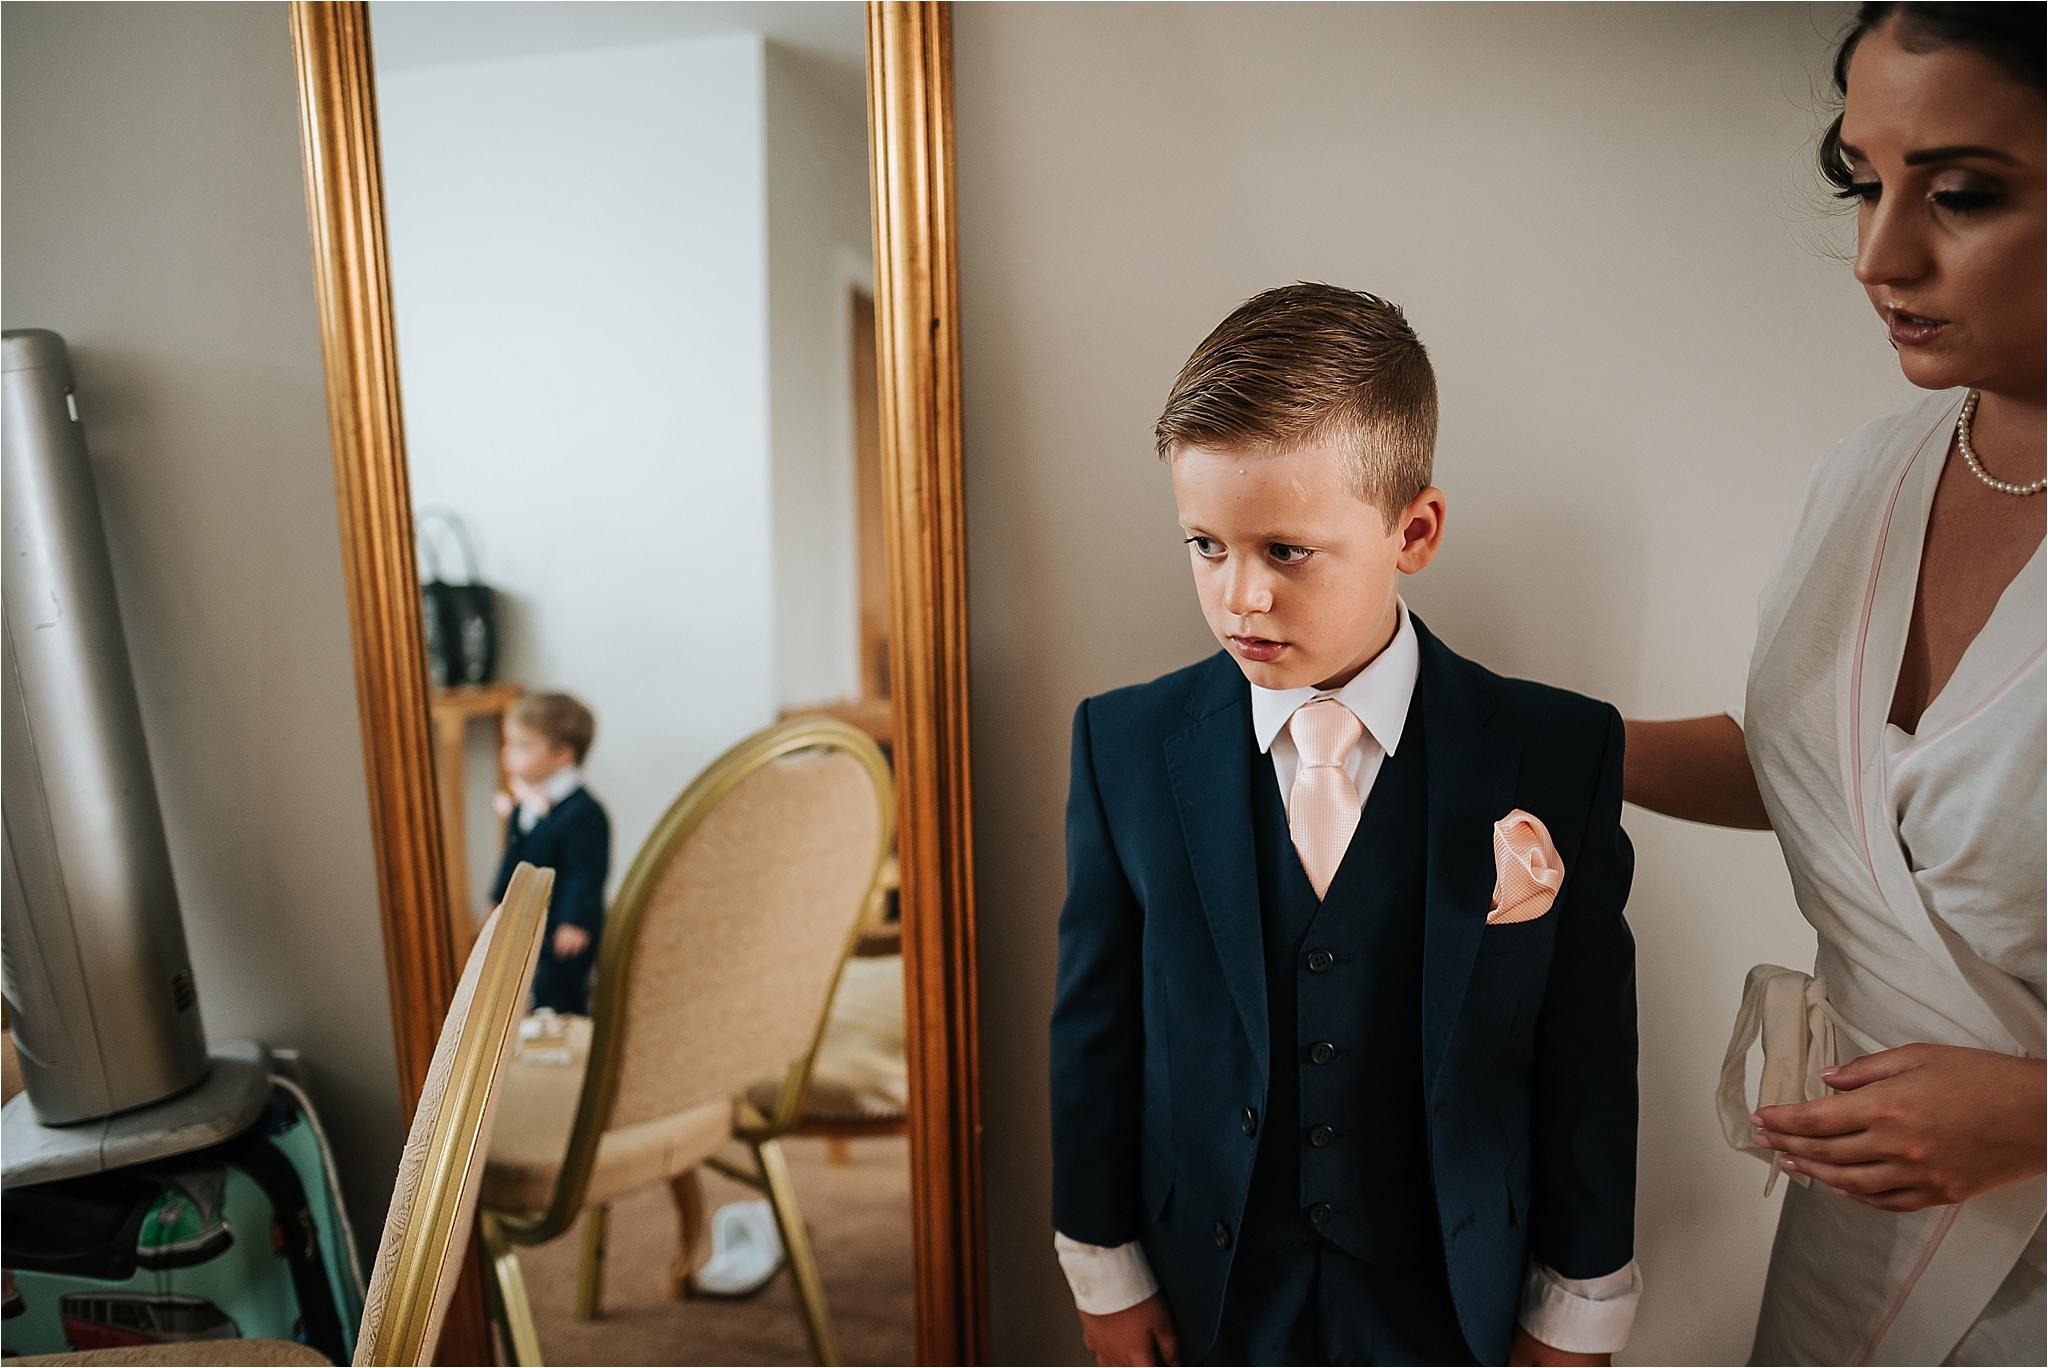 thevilla+lancashire+wreagreen+wedding+photographer88.jpg